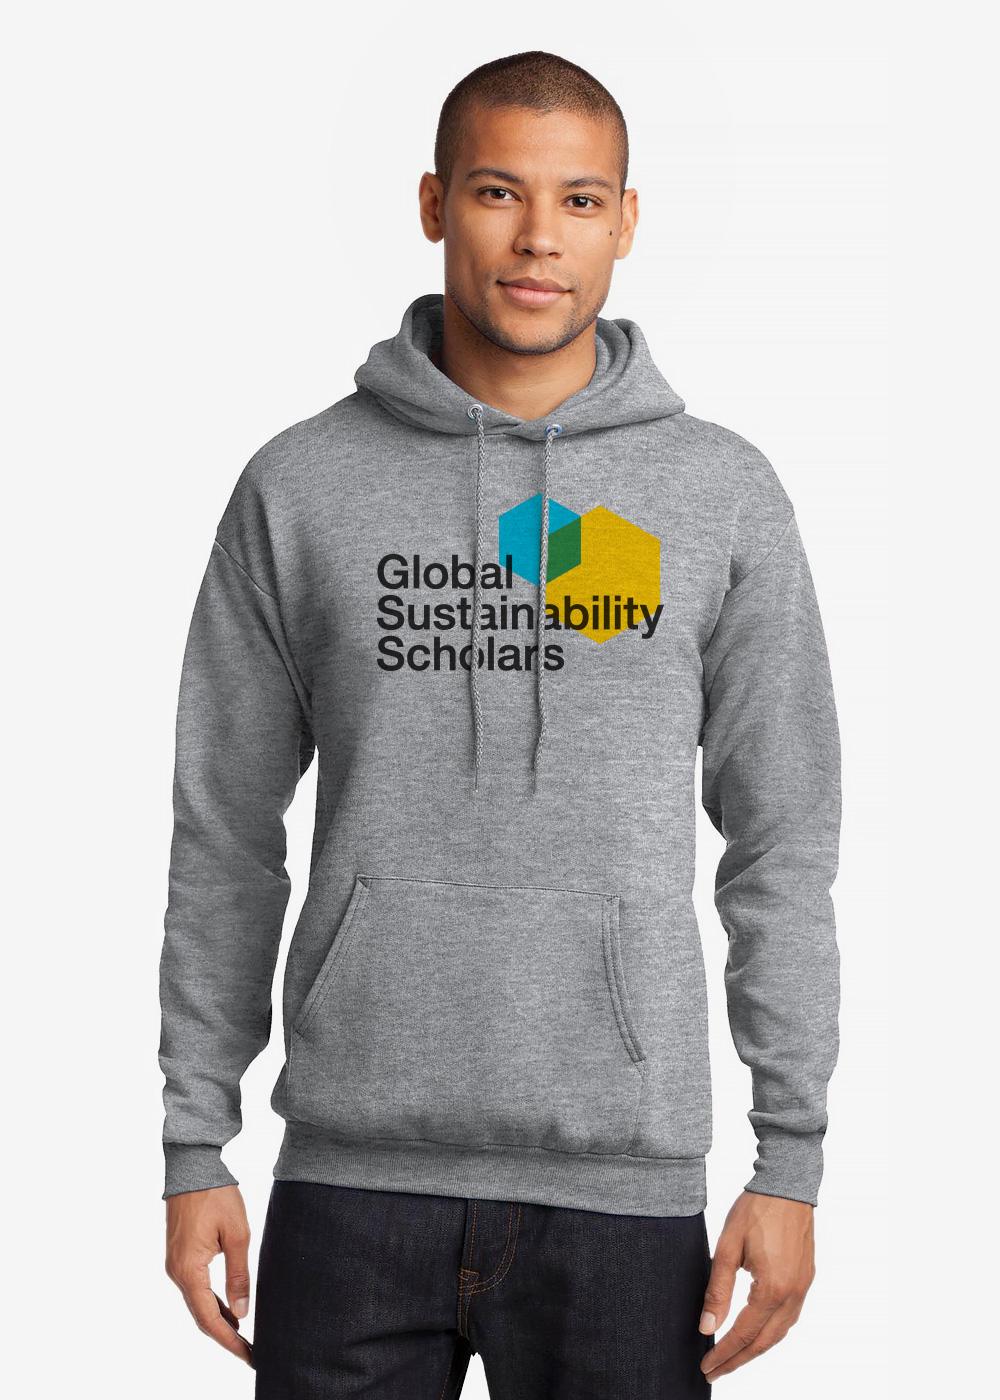 edg-web-gss-1000x1400-sweater.jpg